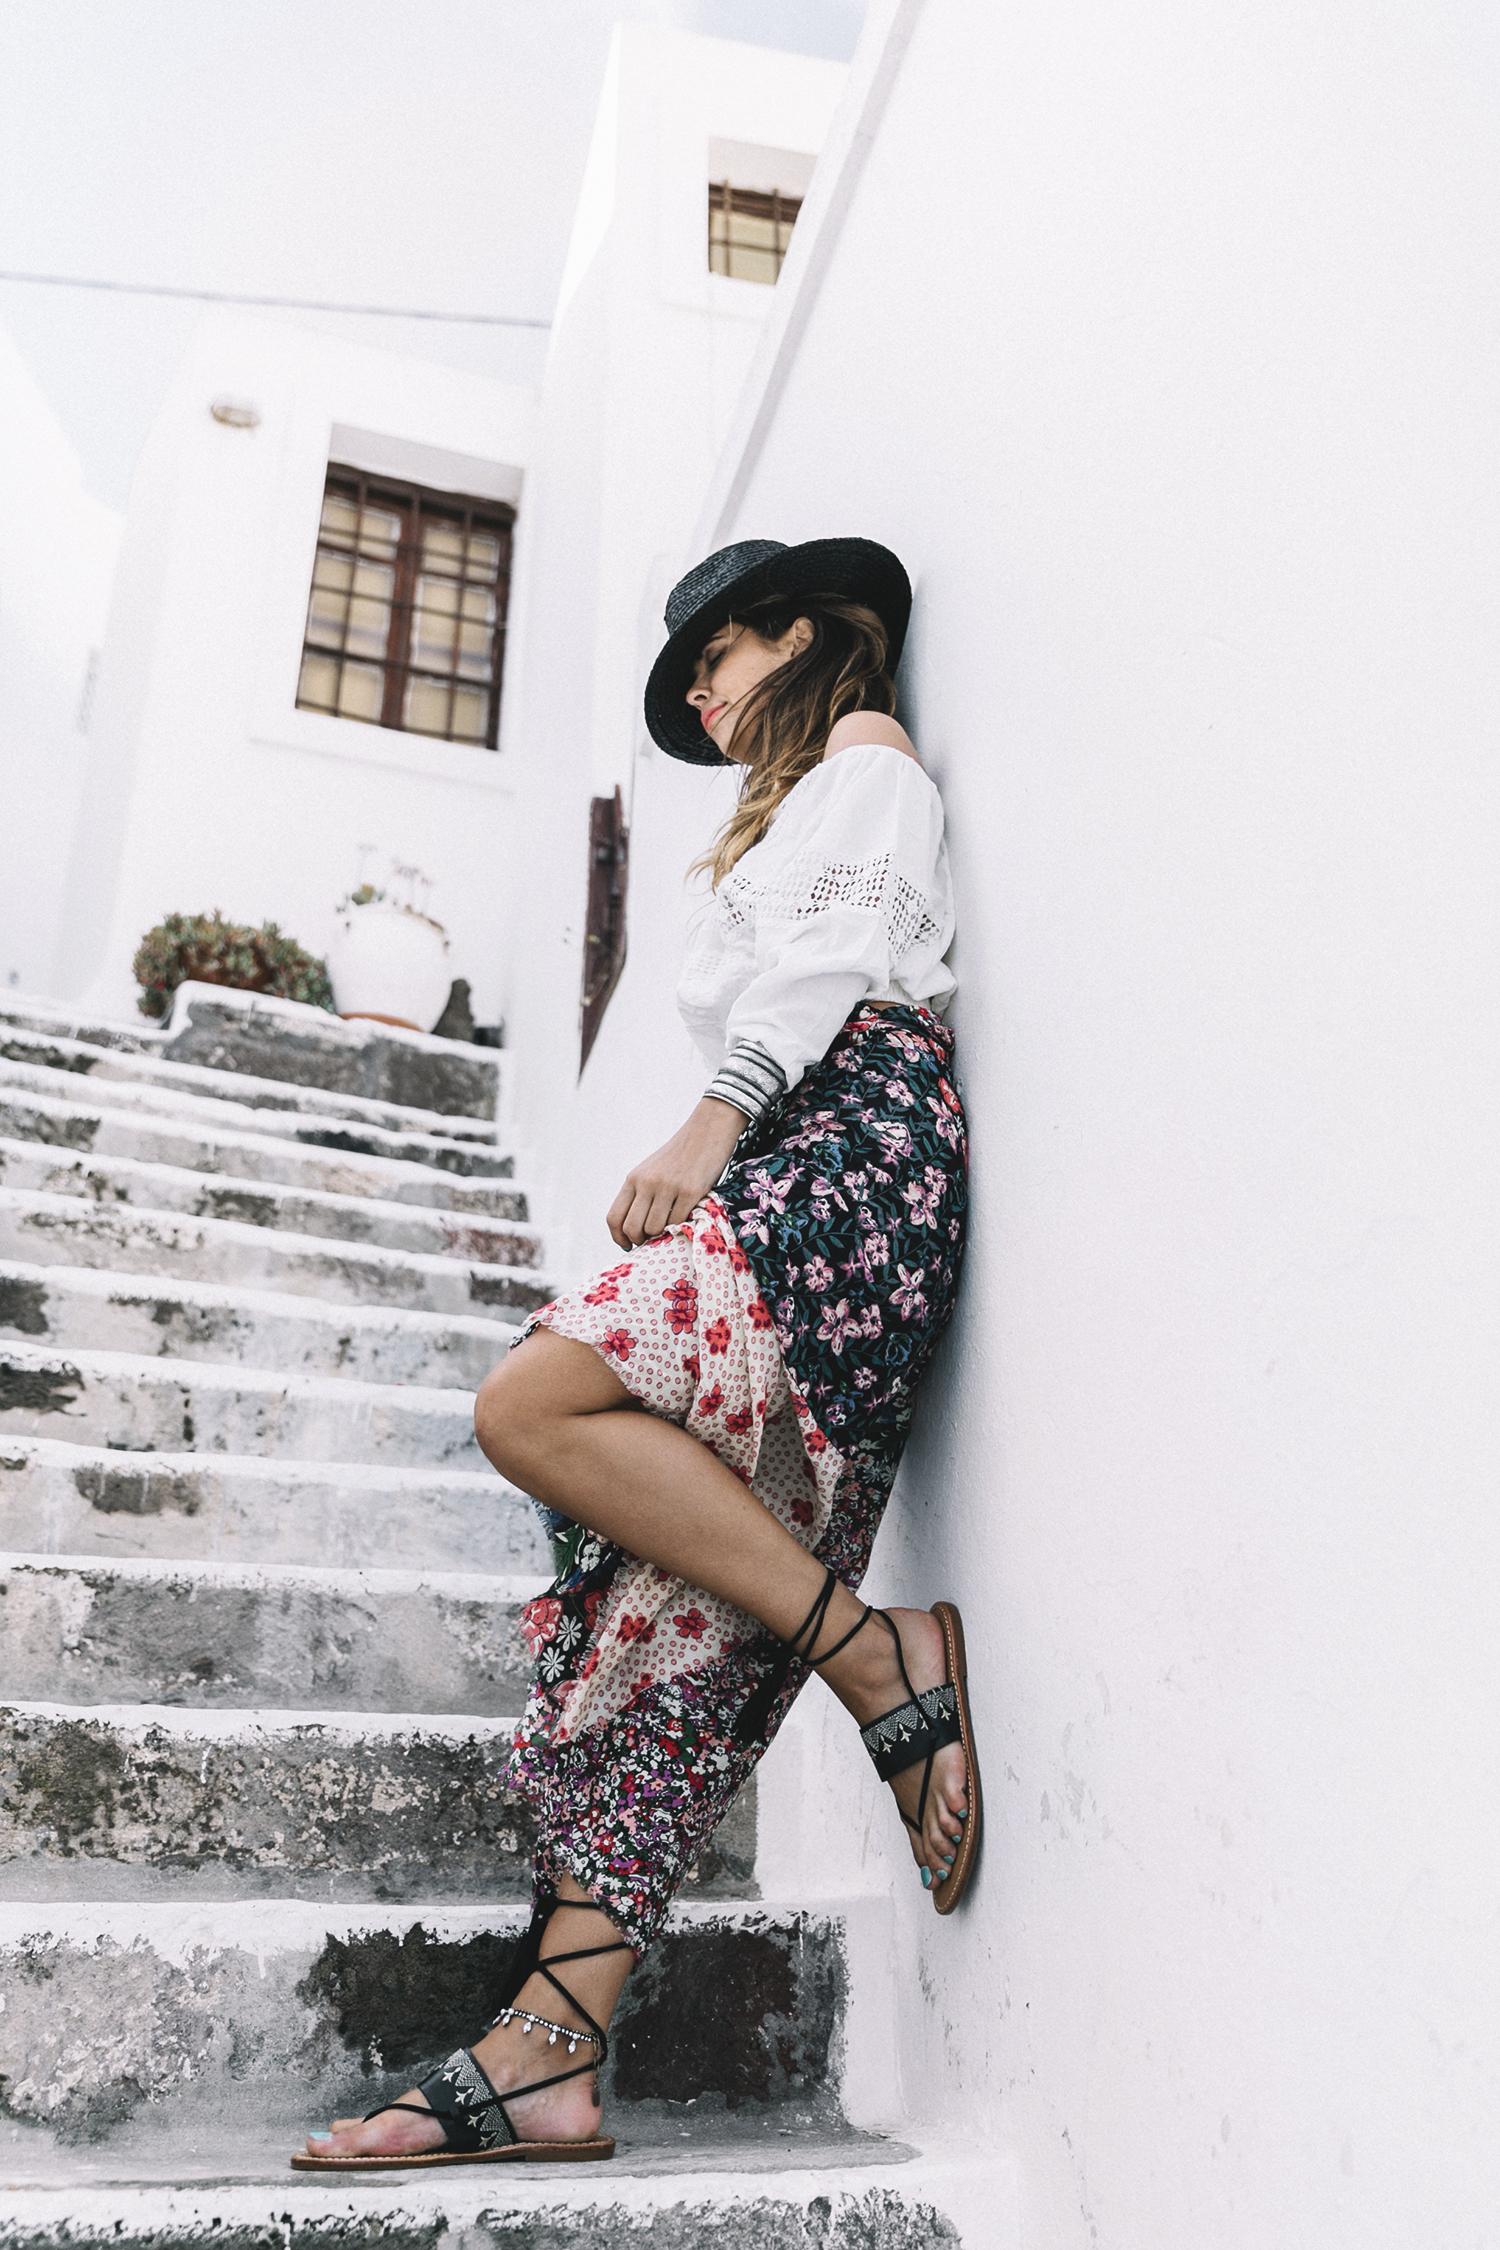 Scarf_As_Skirt_Boho_Top-Straw_Hat-Soludos_Escapes-Soludos_Espadrilles-Summer-Santorini-Collage_Vintage-15